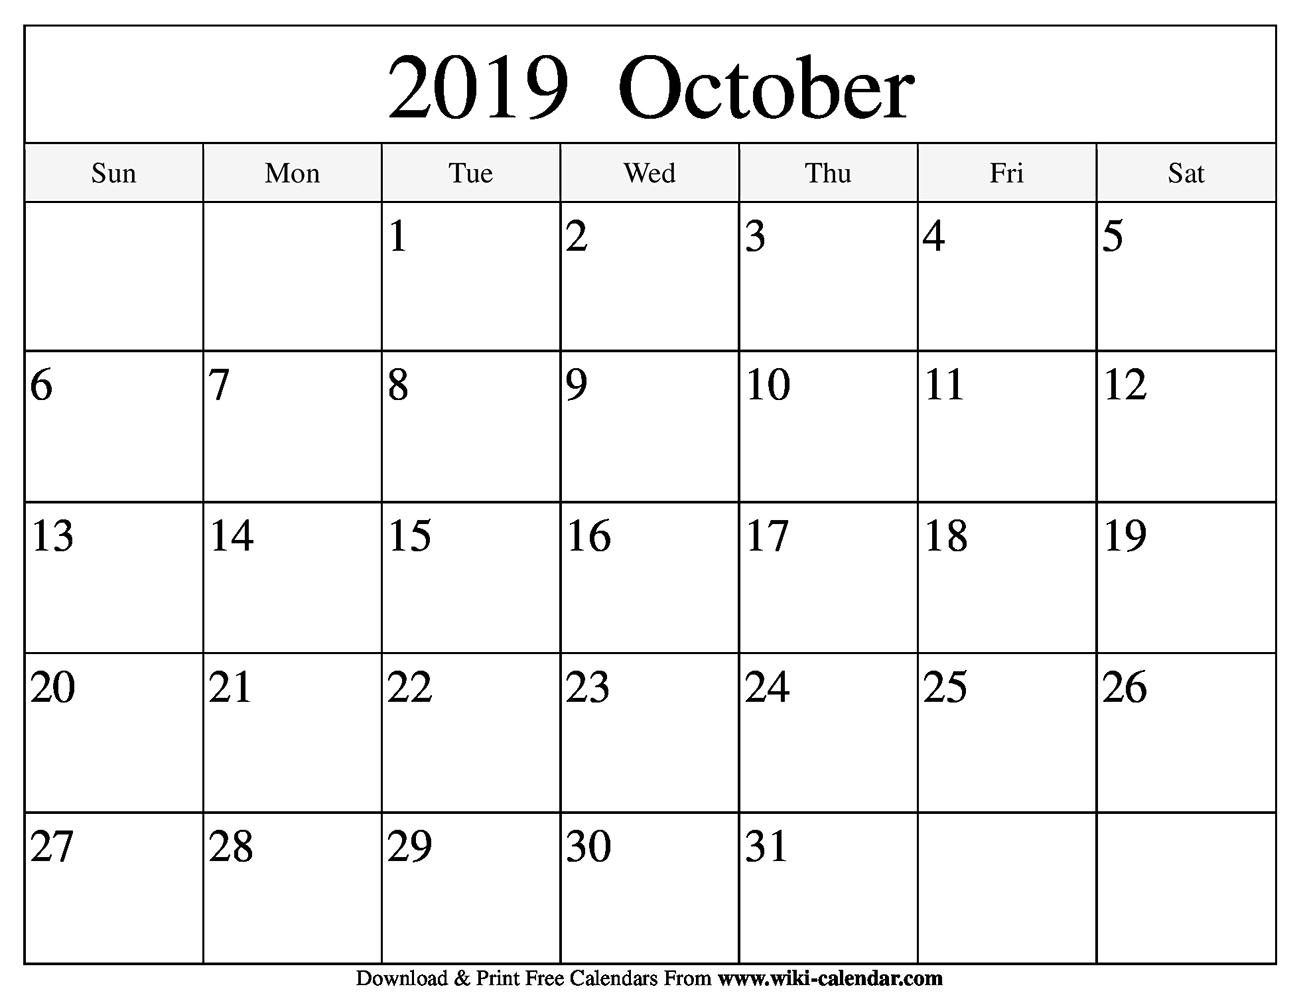 Print Free Calendars - Wpa.wpart.co